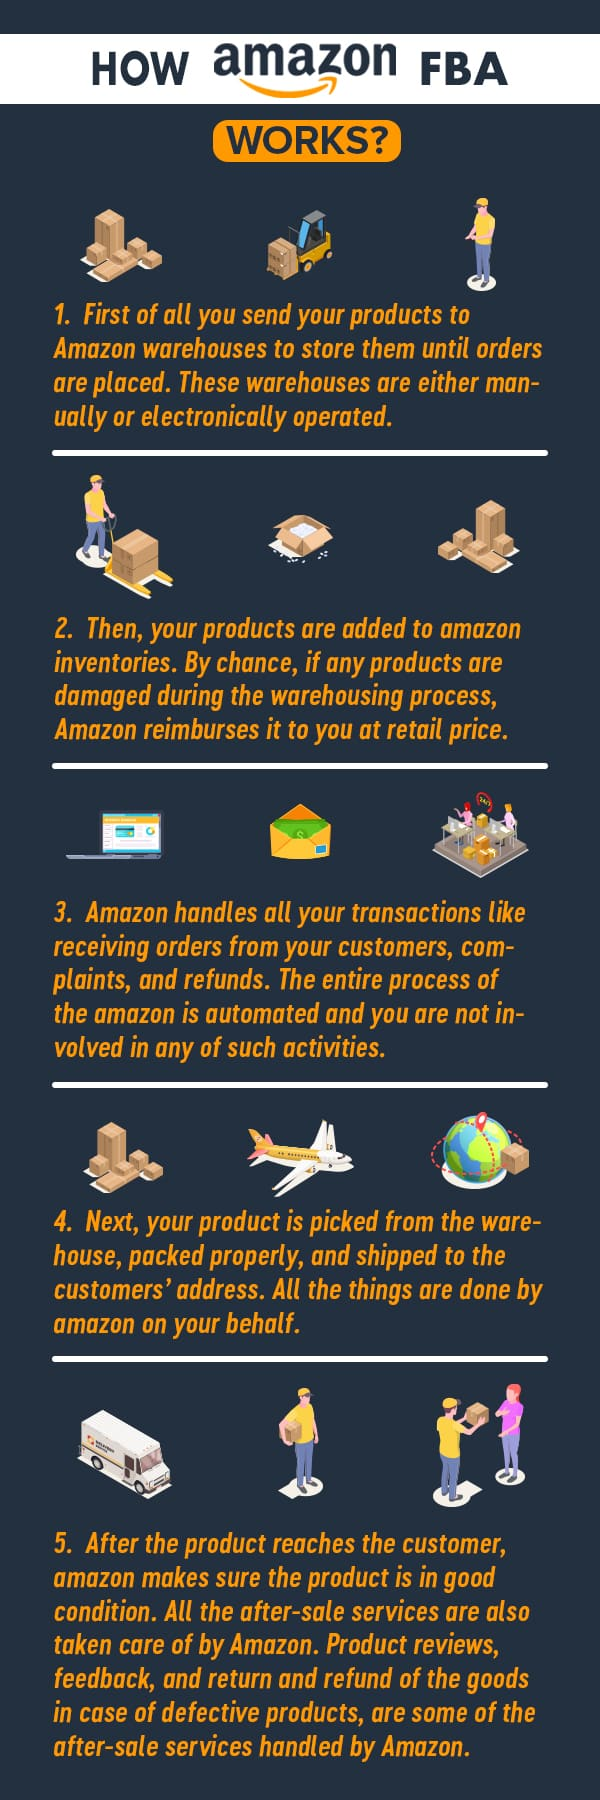 FBA Cheat Sheet To Understand Selling On Amazon FBA Better- Part 1